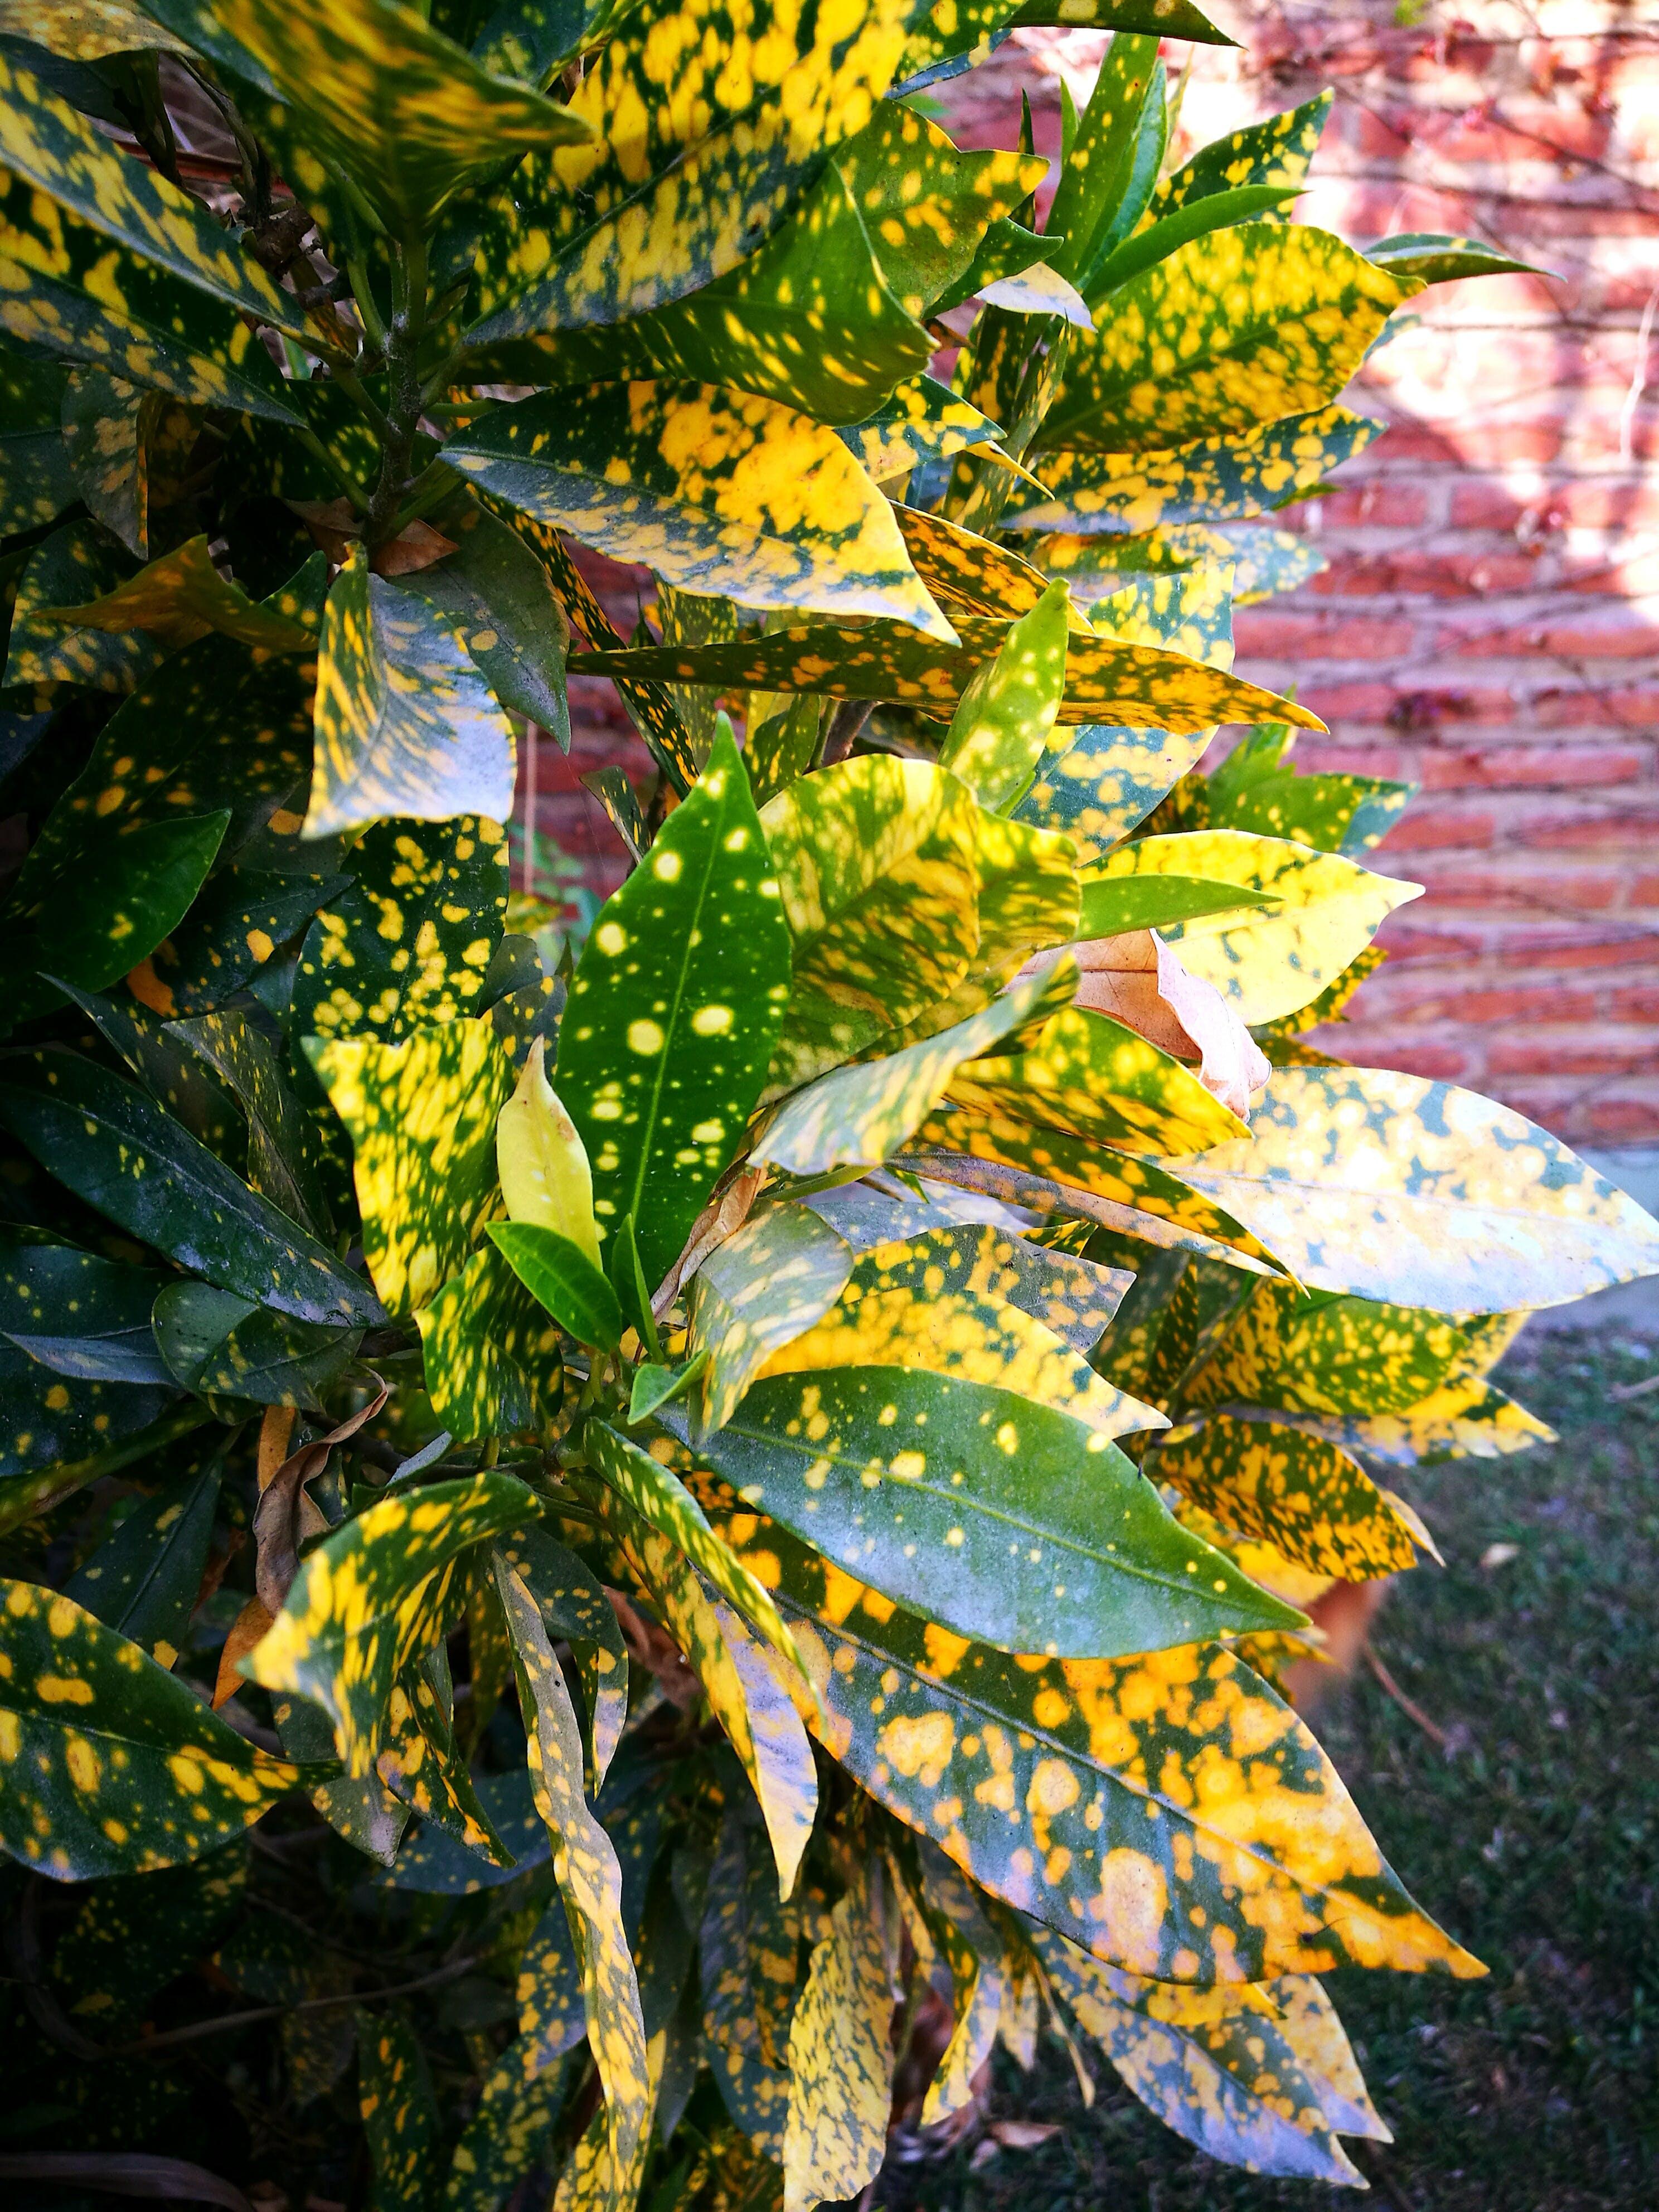 Free stock photo of #green #plantas